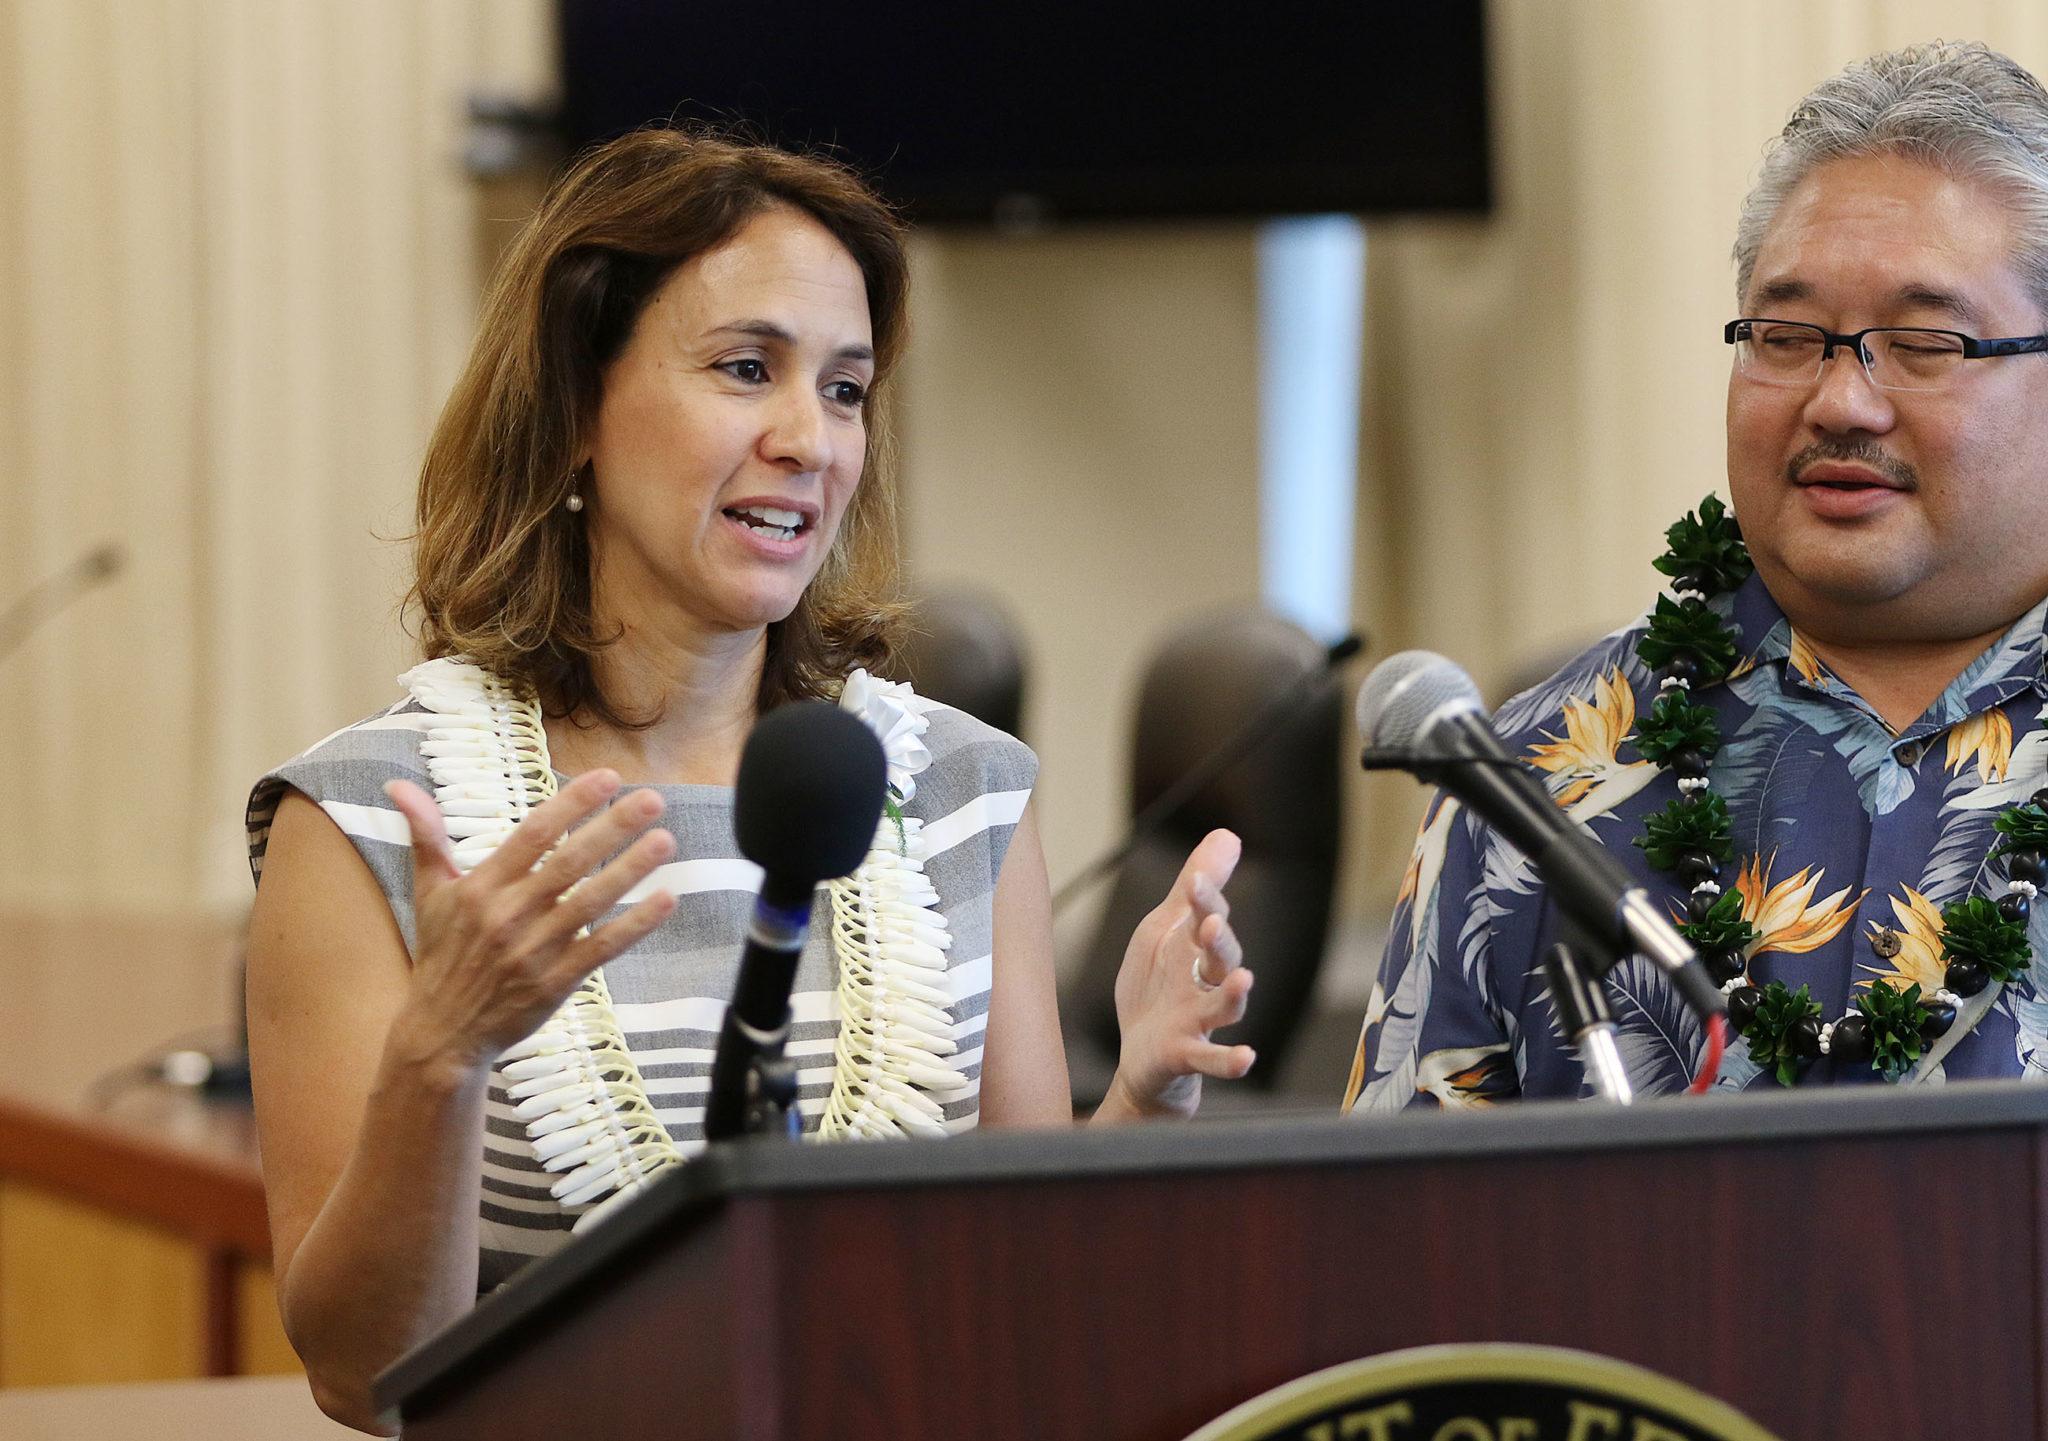 Hawaii Education Superintendent Christina Kishimoto at presser held at the BOE building. 7 june 2017